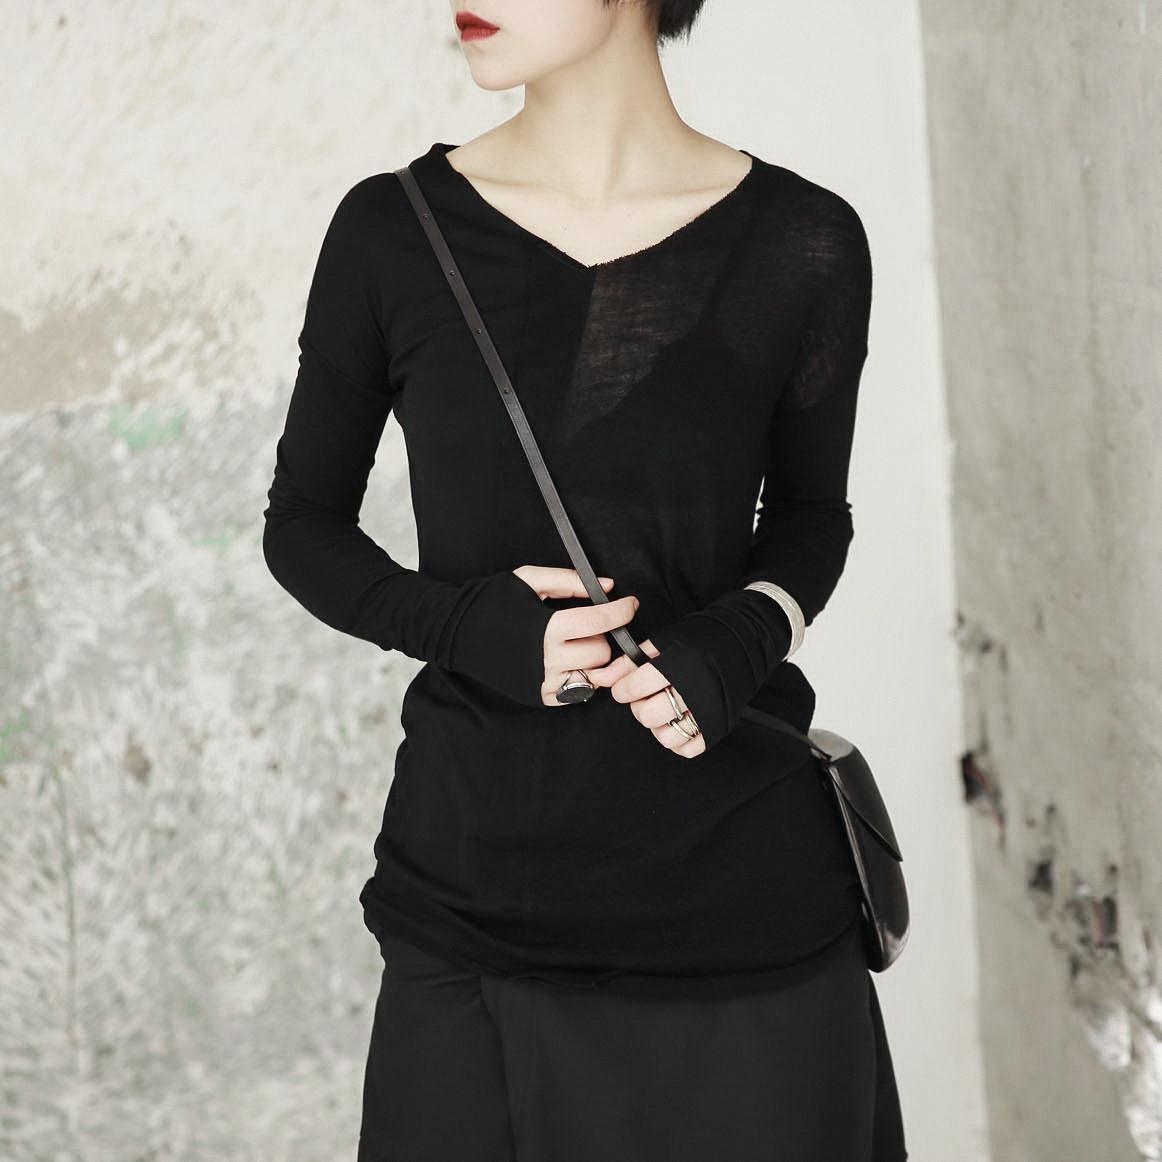 SIMPLE BLACK 春秋新款暗黑风V领拼接半透不规则长袖打底T恤